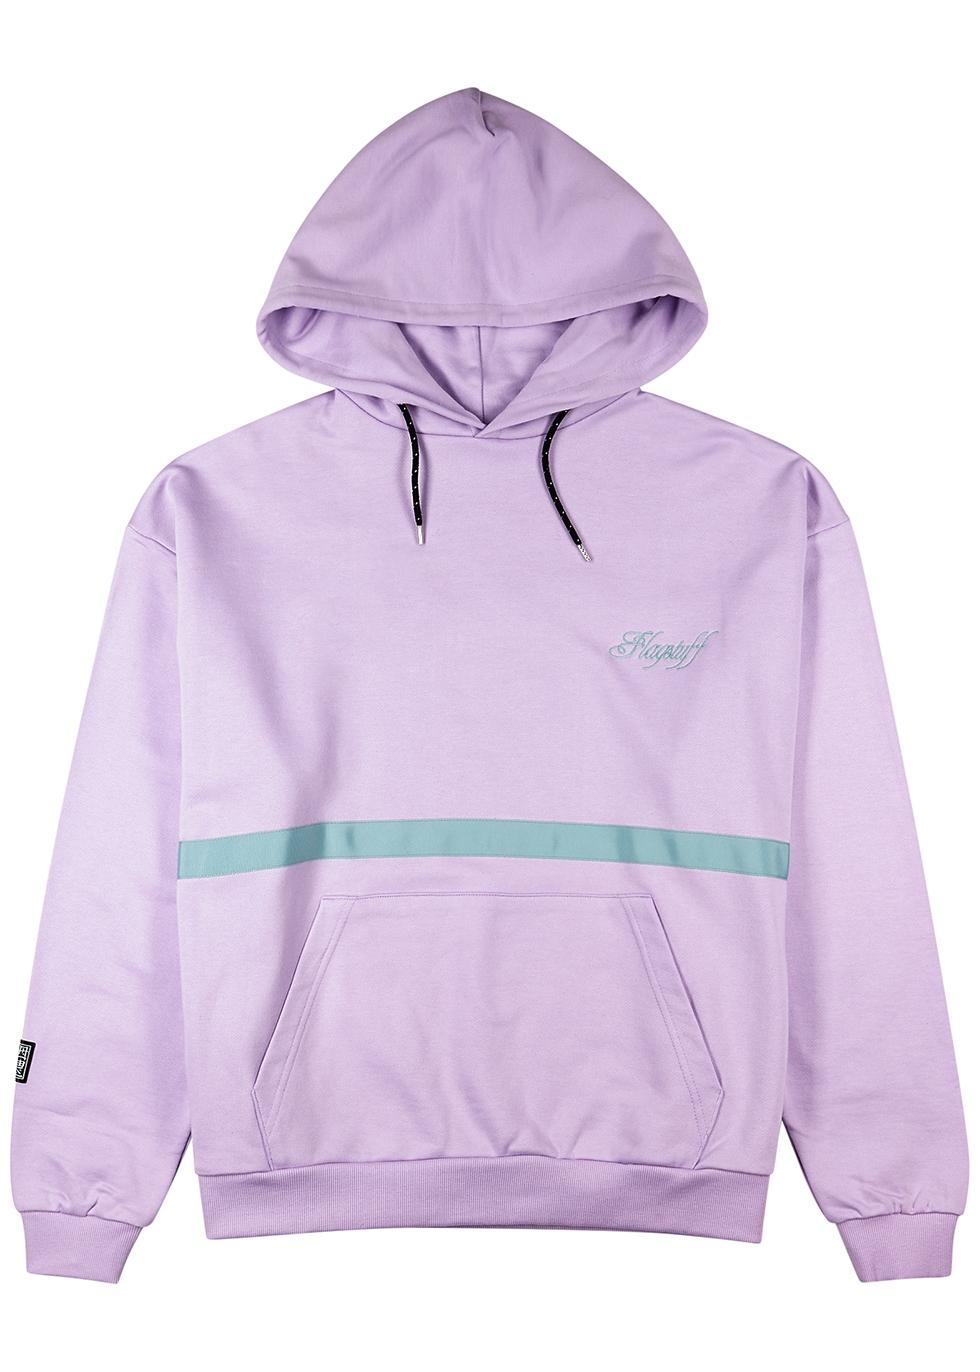 Lilac printed hooded cotton sweatshirt